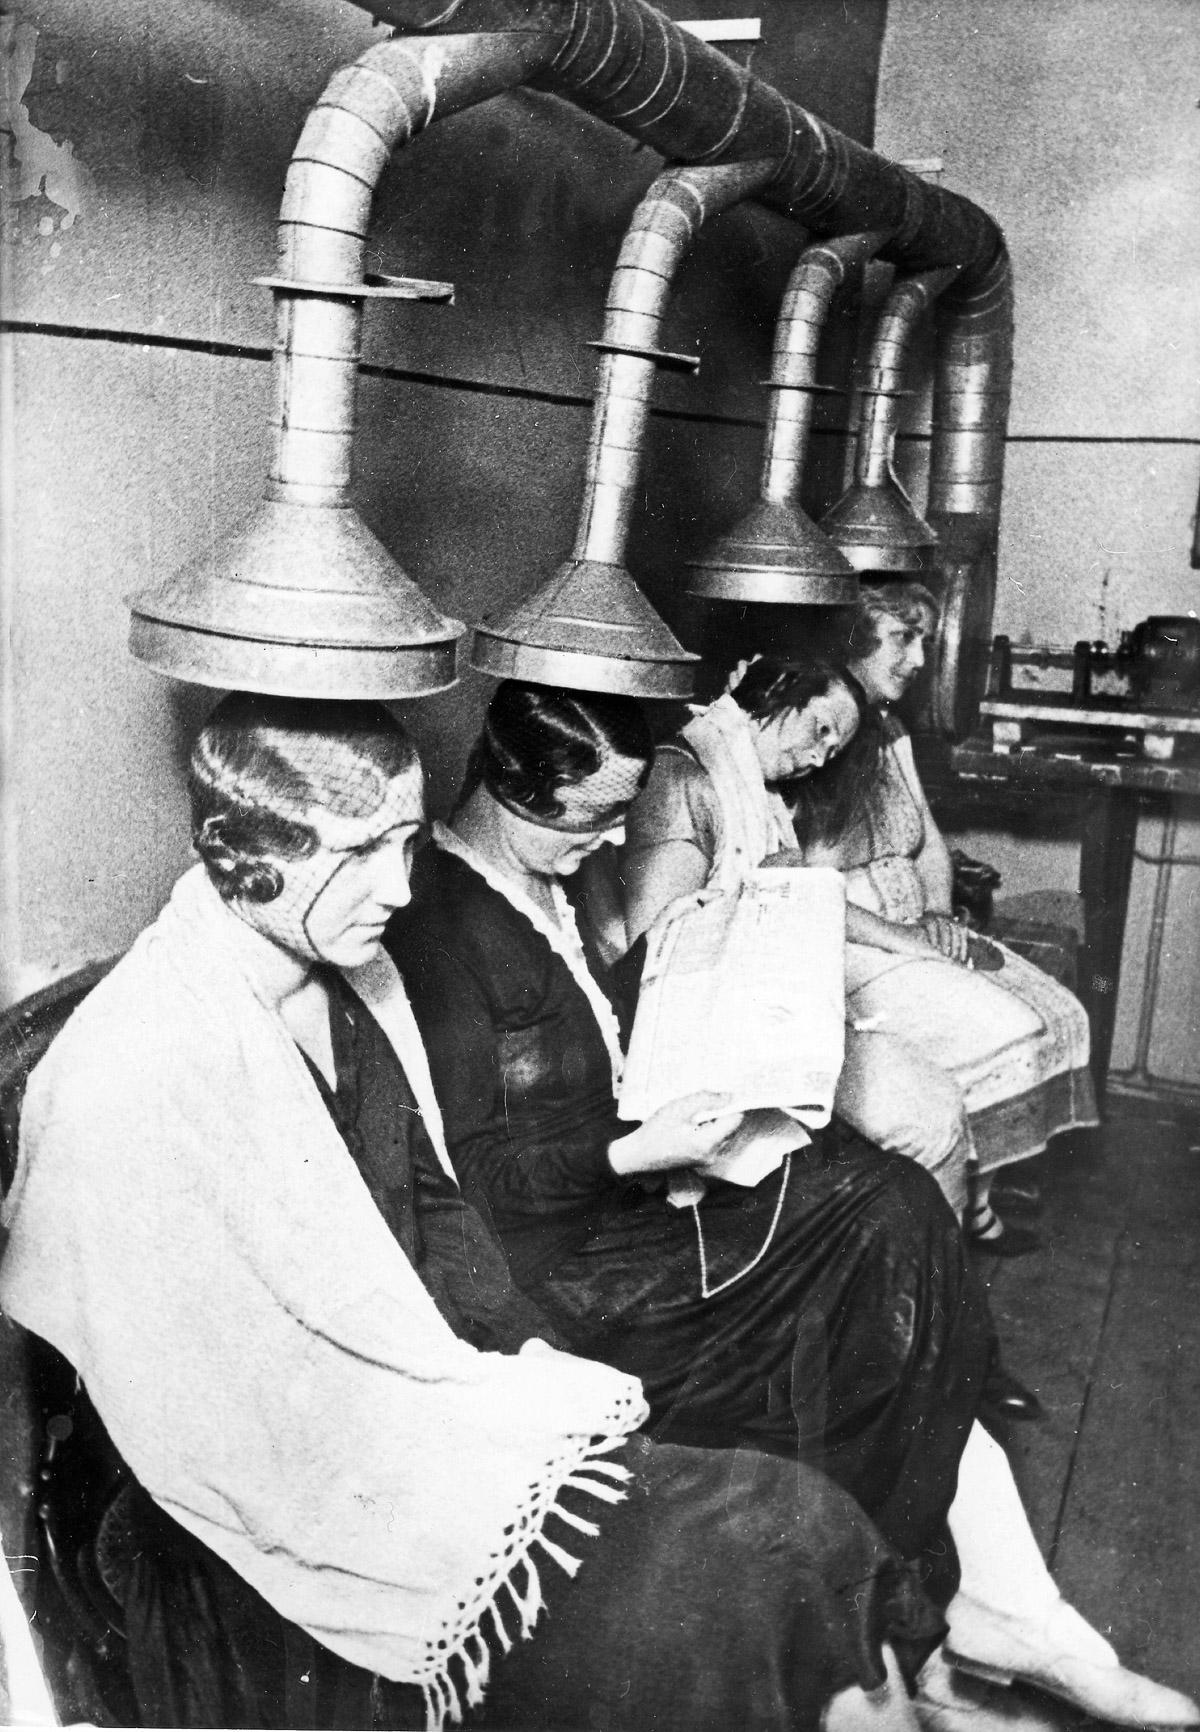 Russia; Moscow; women sitting under a hair dryer in a hairdresser; taken by Emil Strassberg - 1933